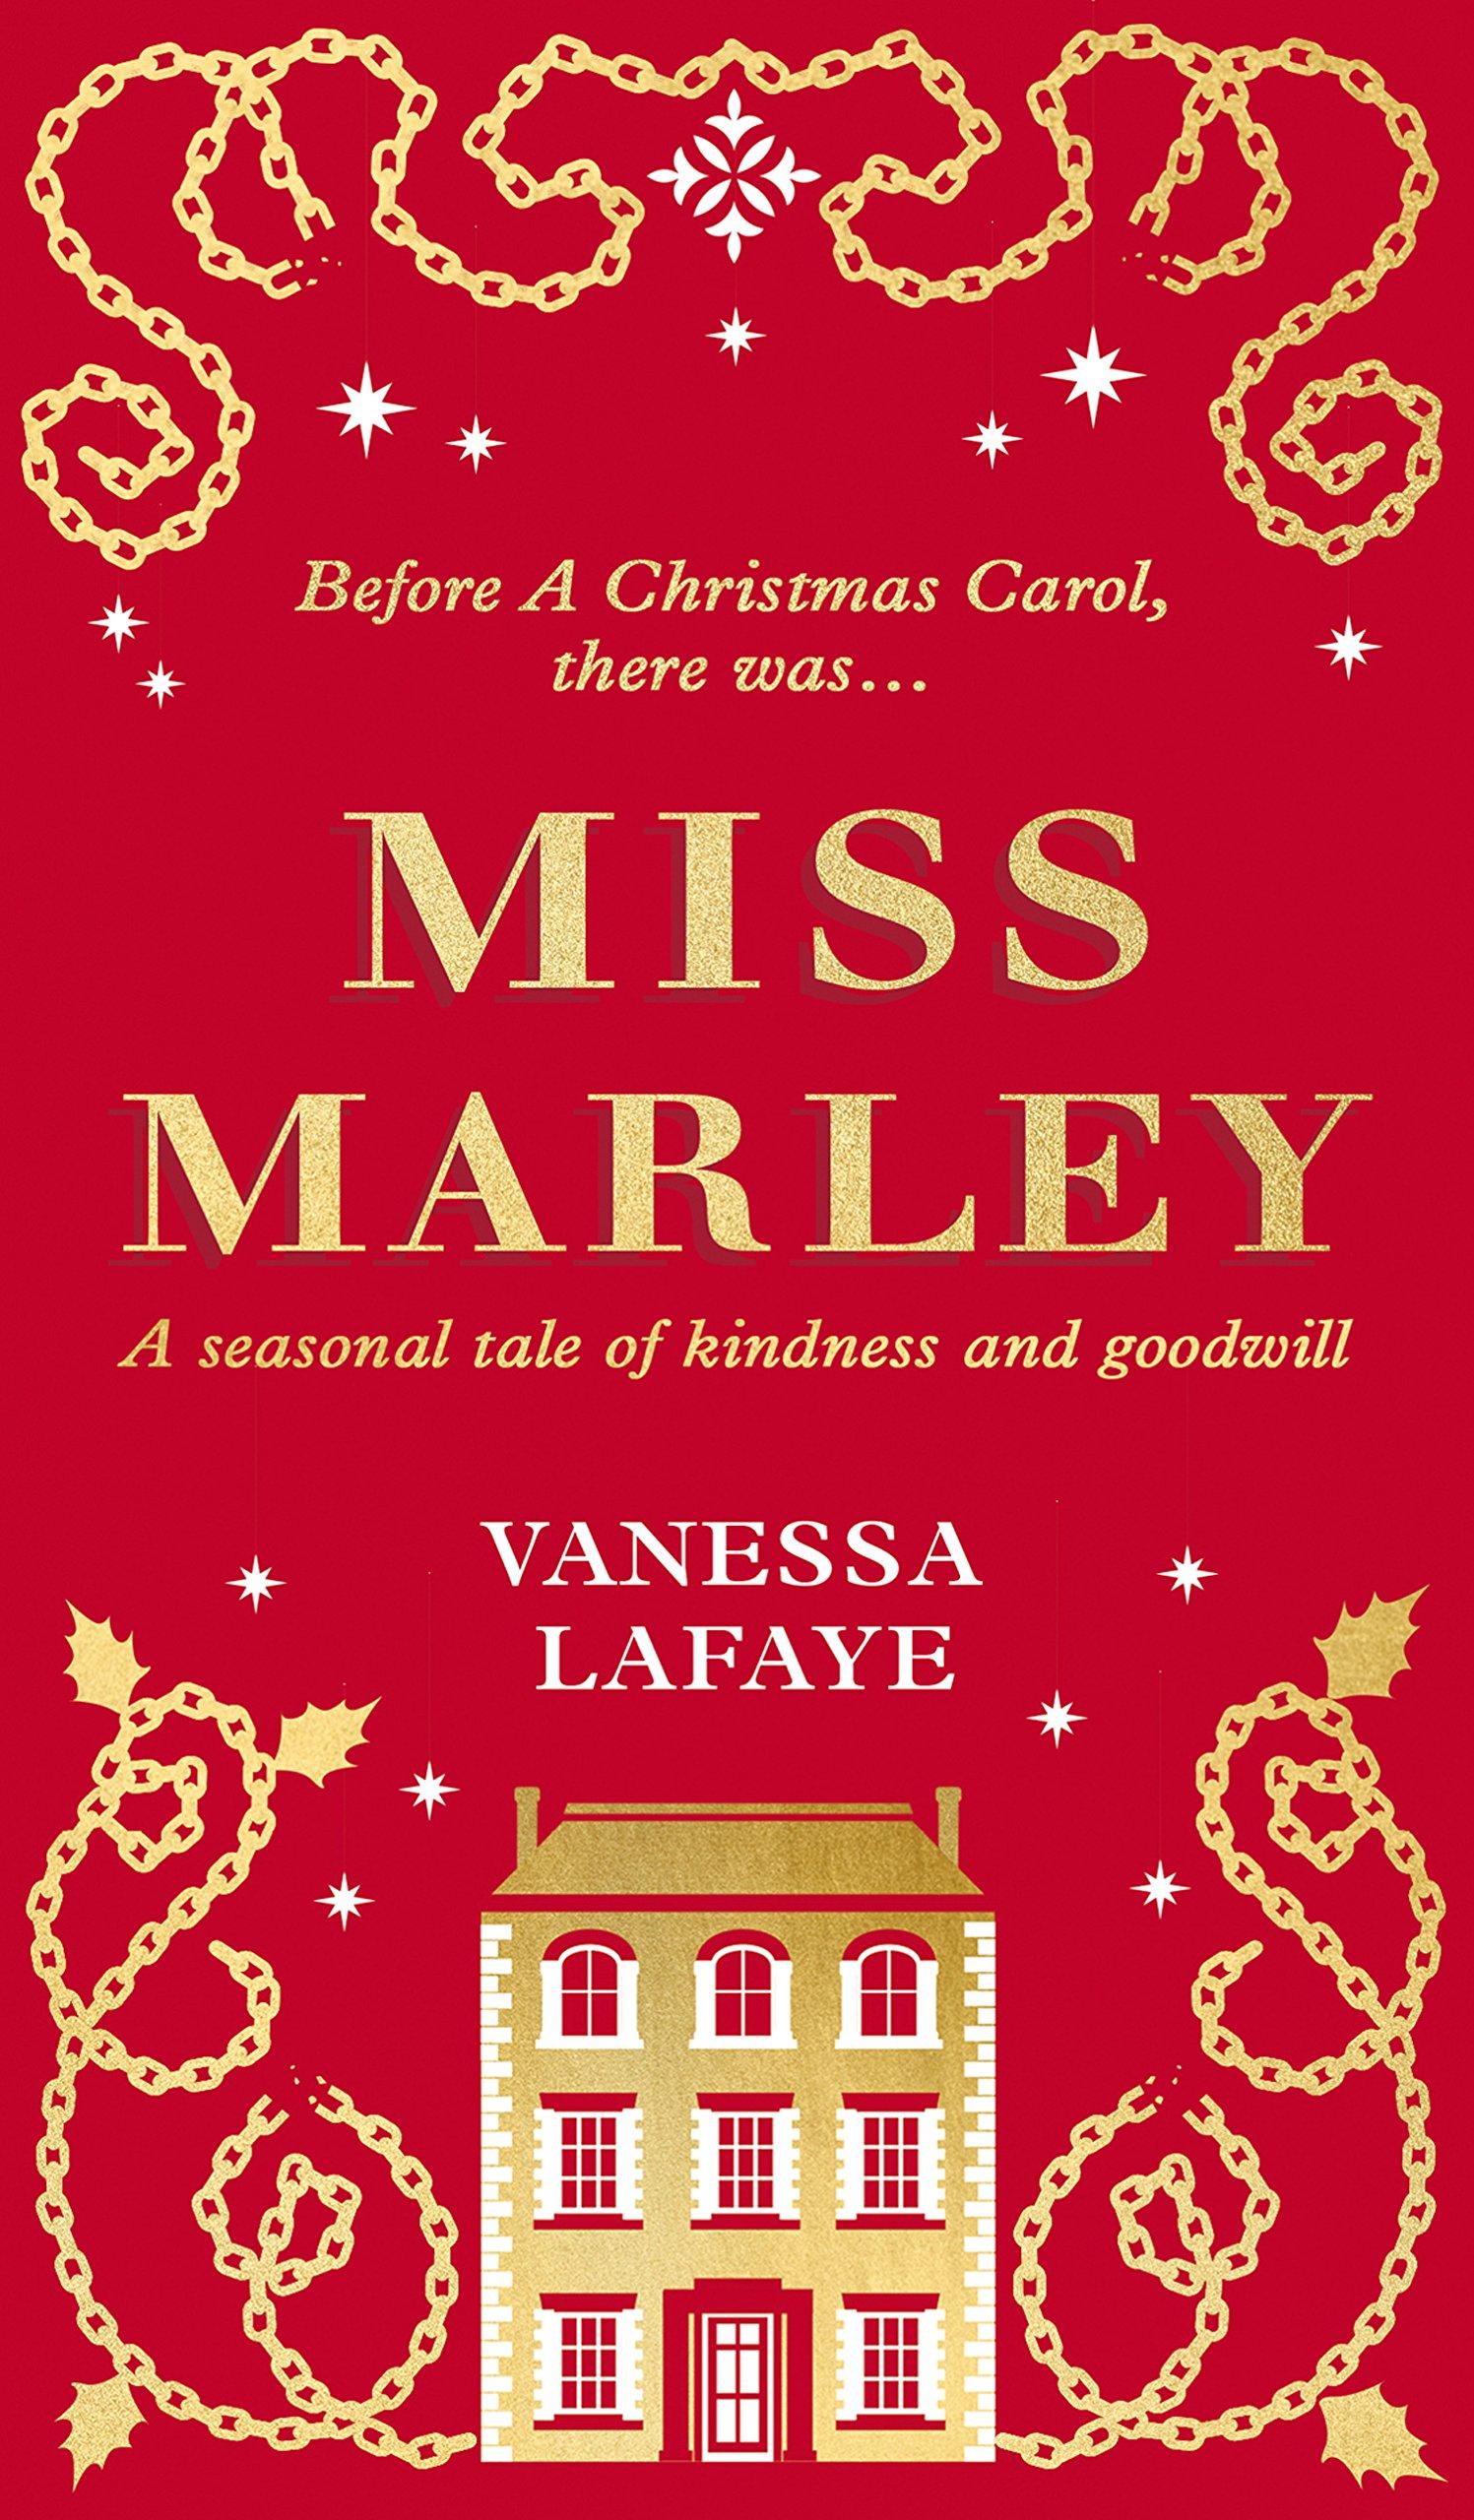 Miss Marley: A Christmas ghost story - a prequel to A Christmas Carol de Vanessa Lafaye ( 91m6WquIBIL